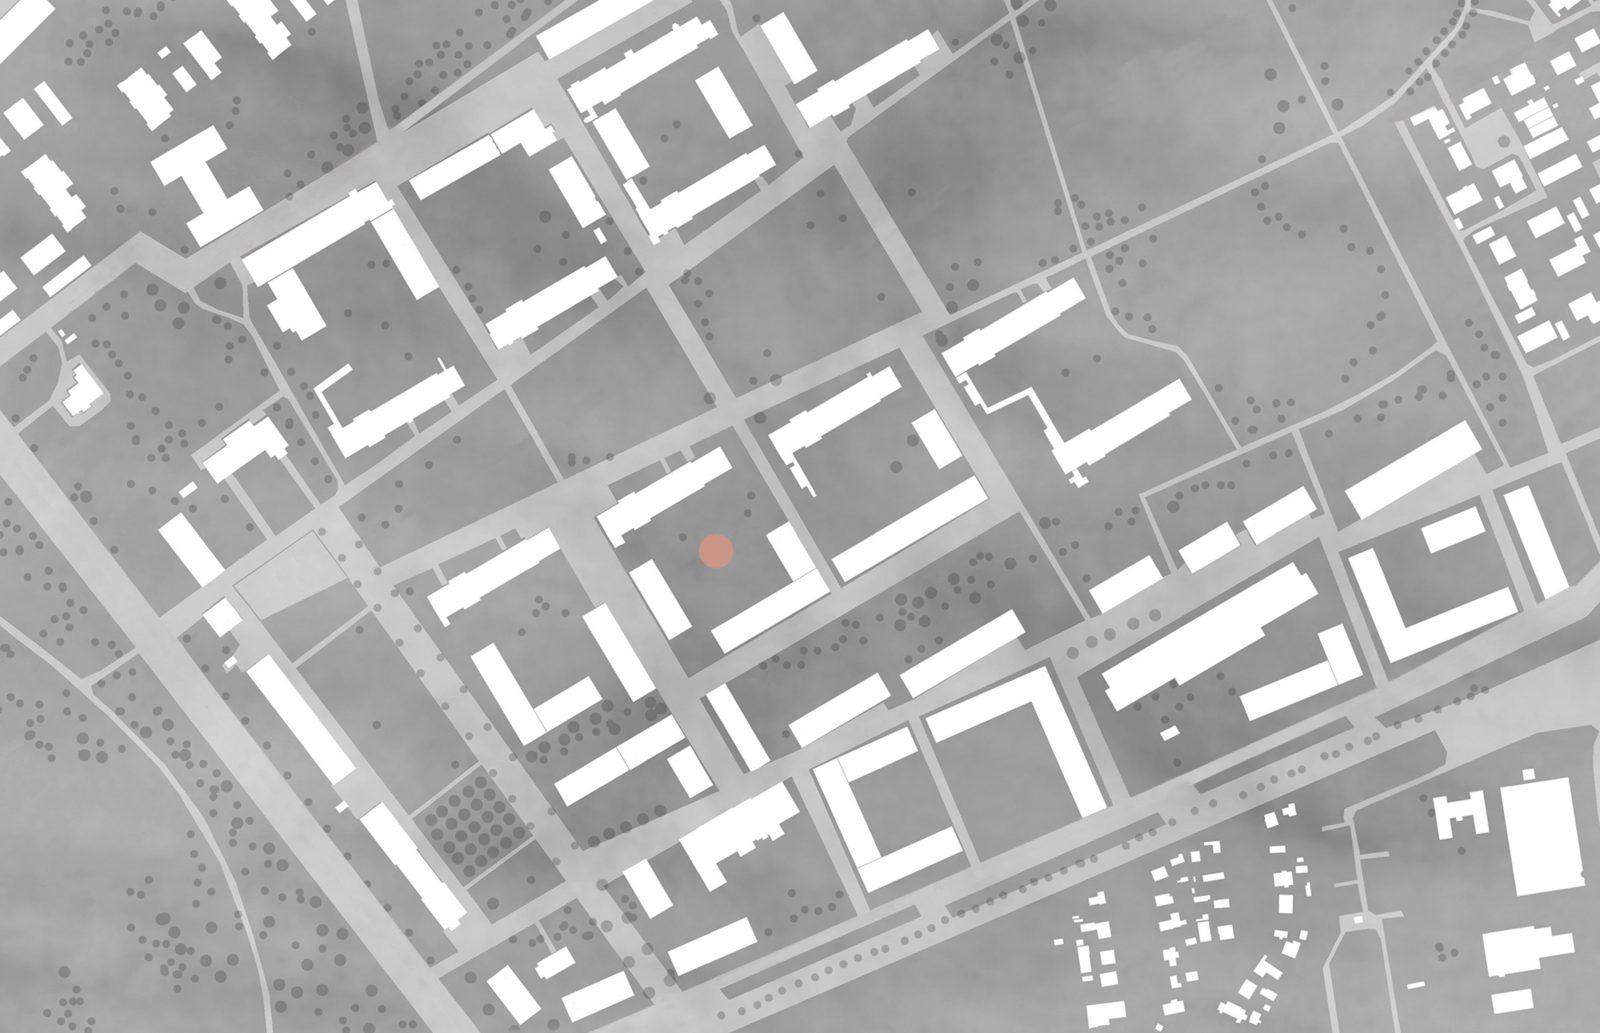 KjellanderSjöberg SegePark Siteplan 3600x2324